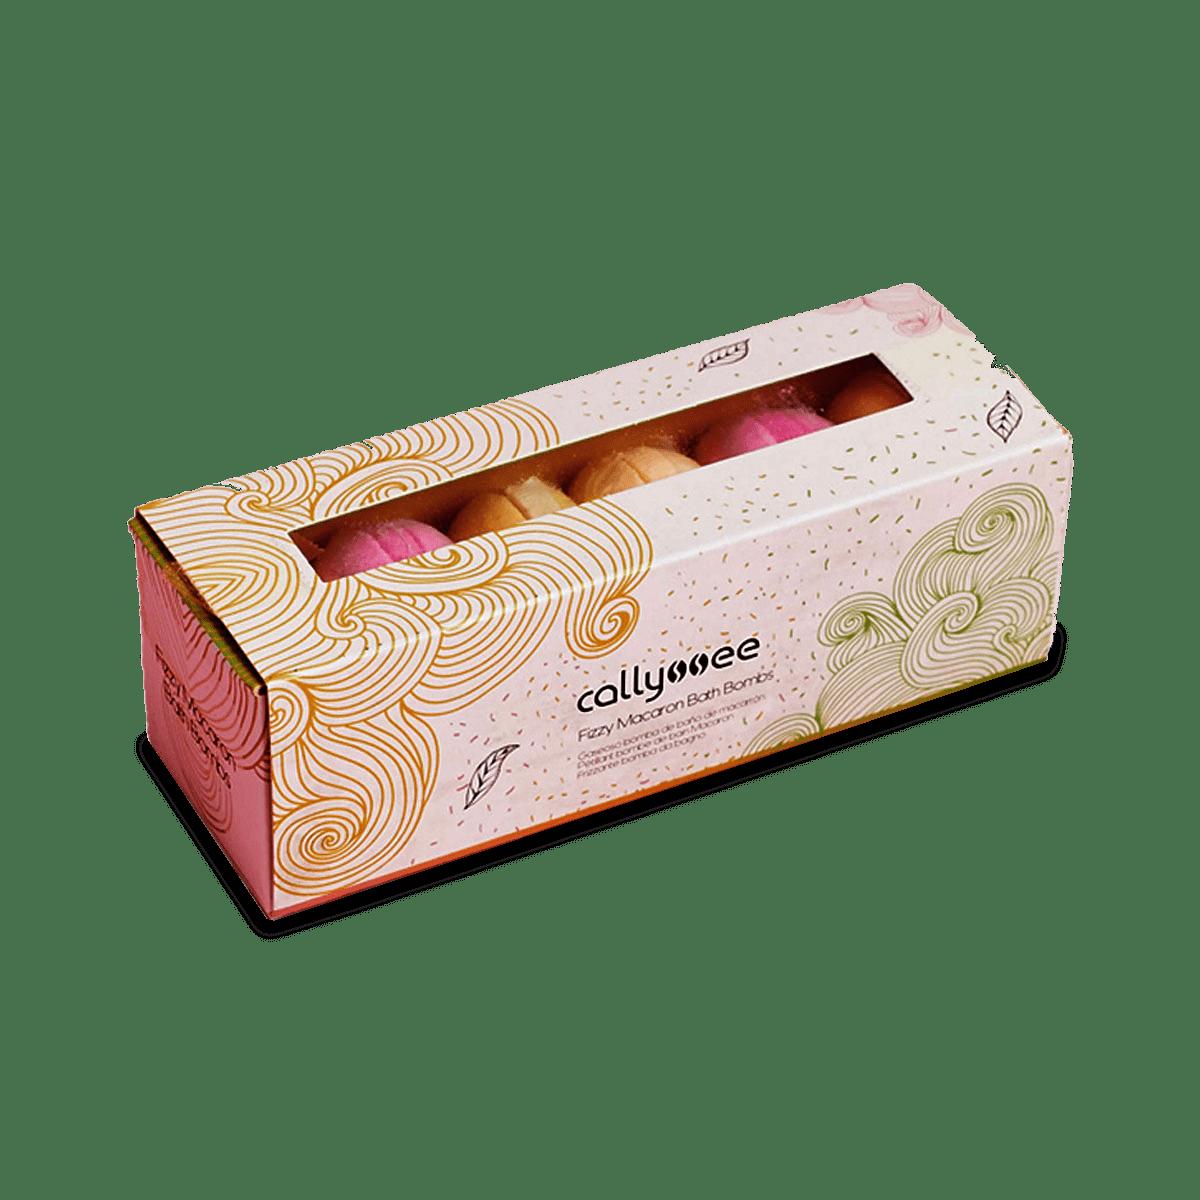 Bath Bomb Boxes: A Guide